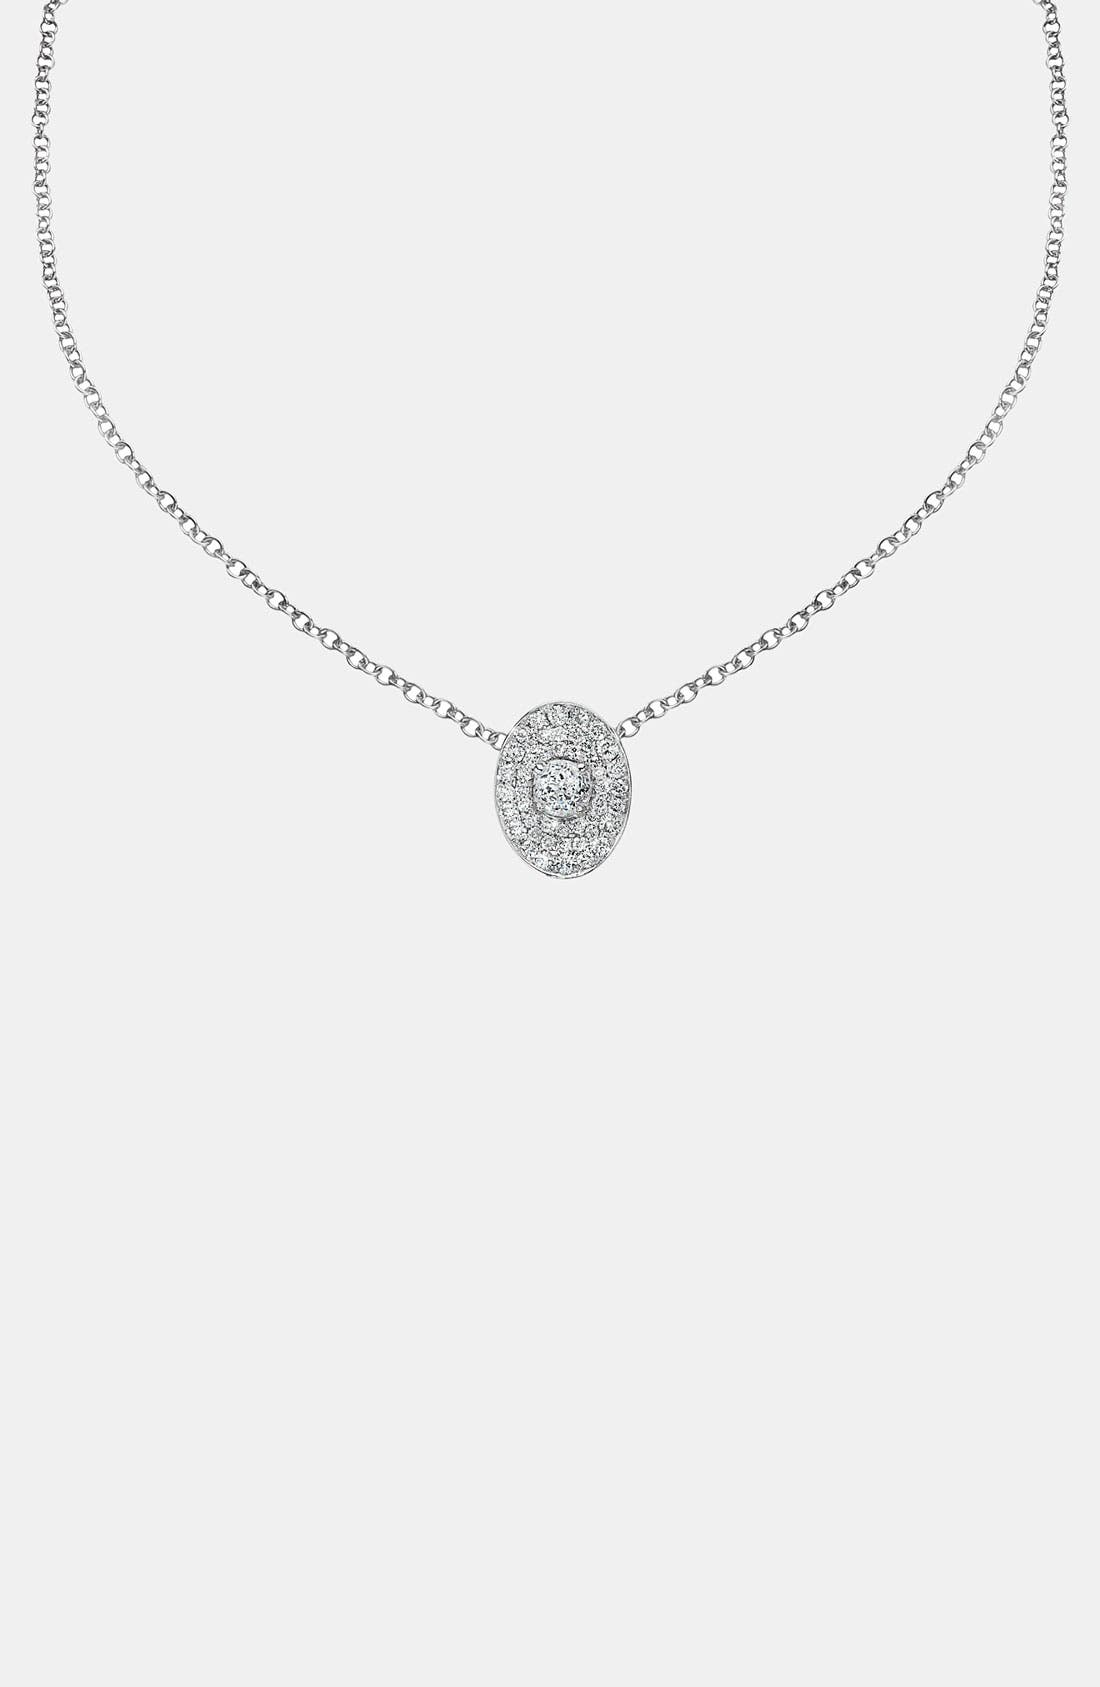 Main Image - Ivanka Trump 'Signature' Oval Pavé Diamond Pendant Necklace